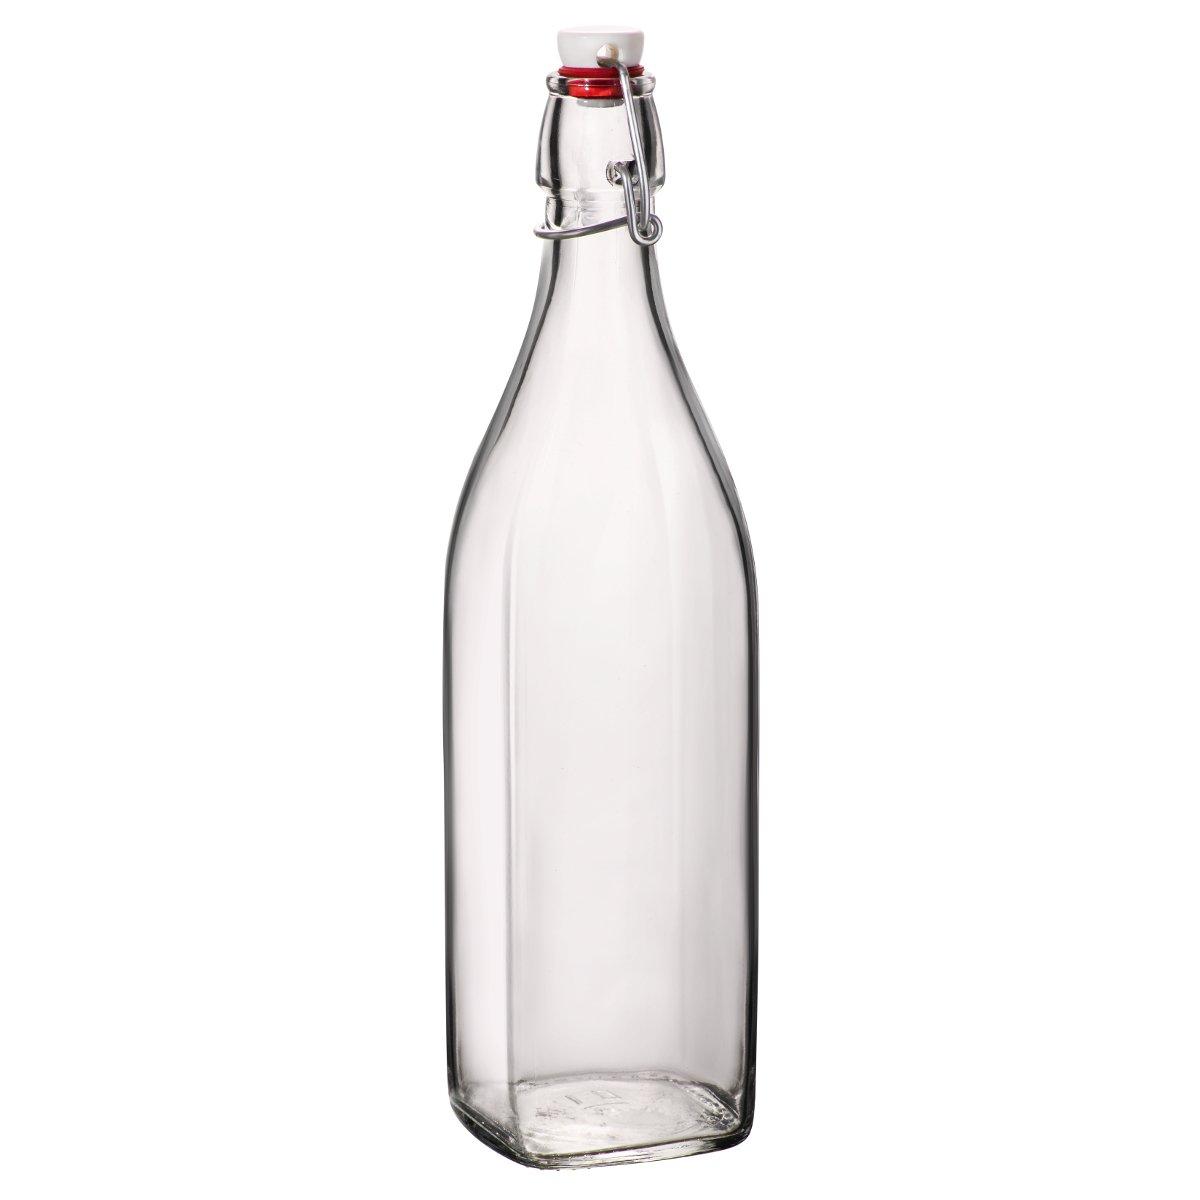 Bormioli Rocco Swing Glass 33.75 Ounce Bottle, Set of 12